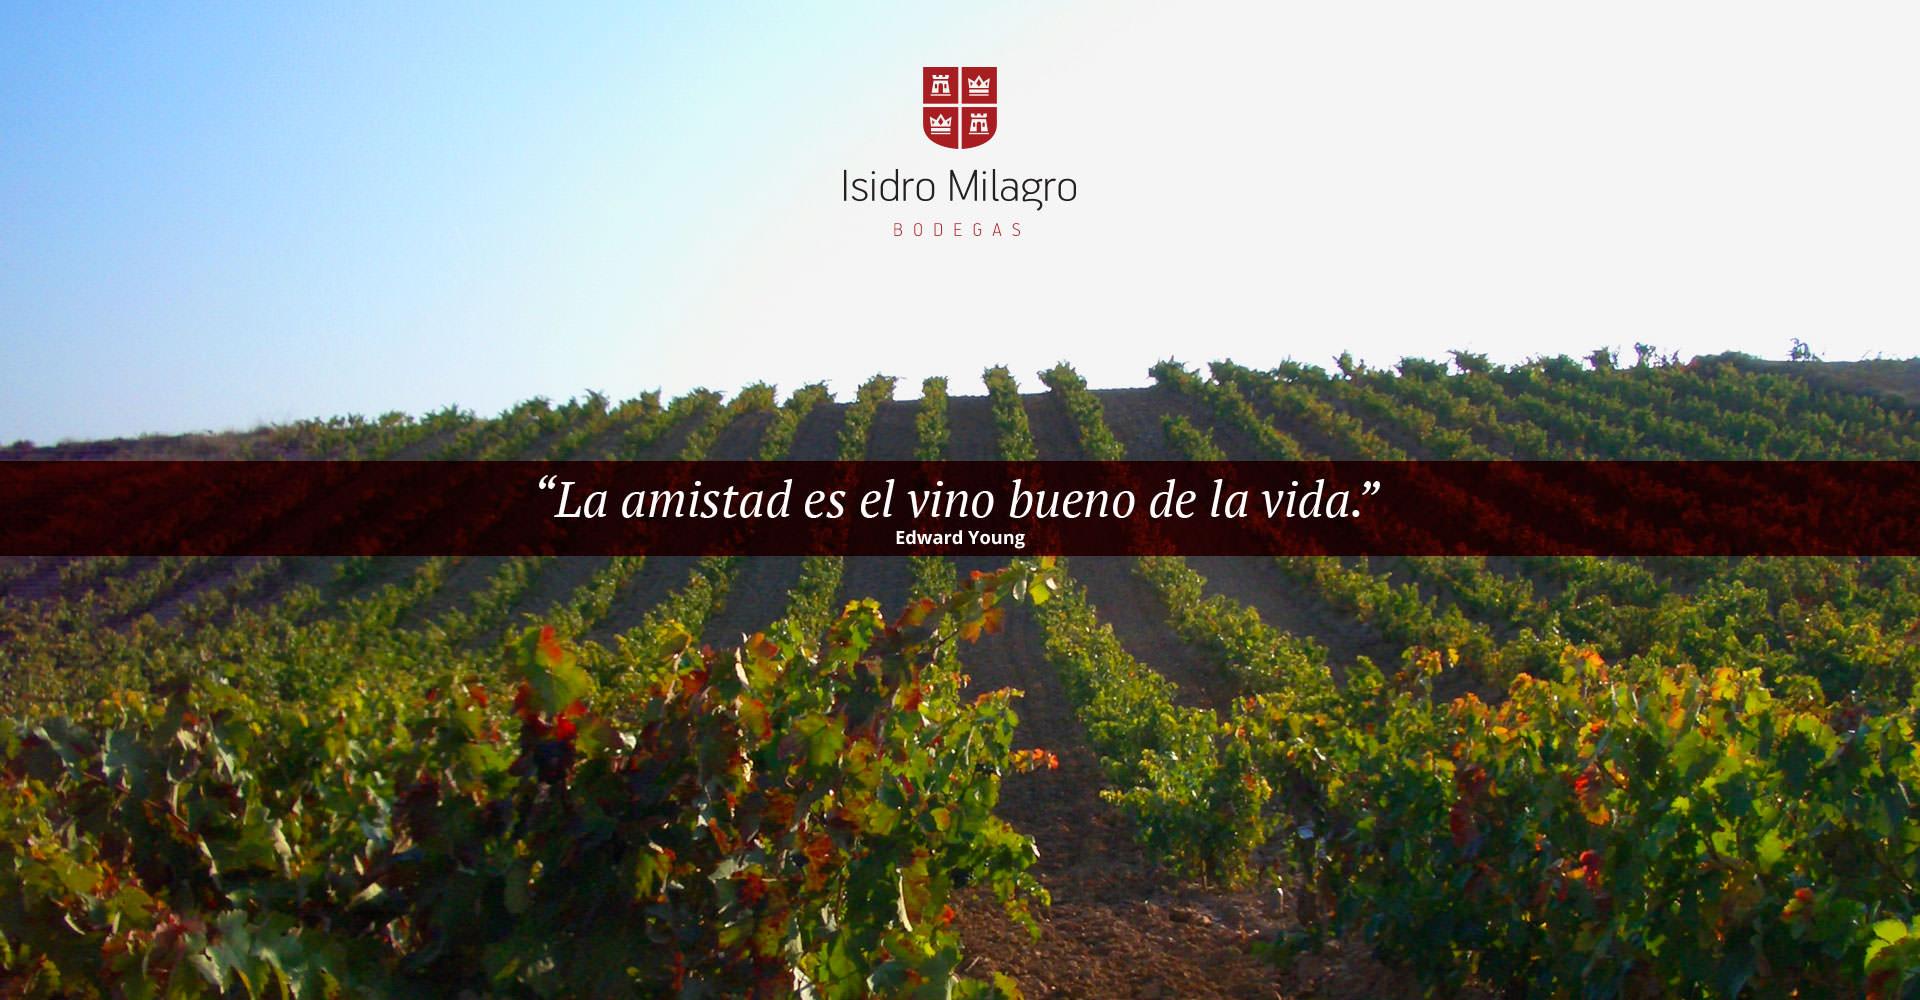 La amistad es el vino bueno de la vida. Bodegas Isidro Milagro